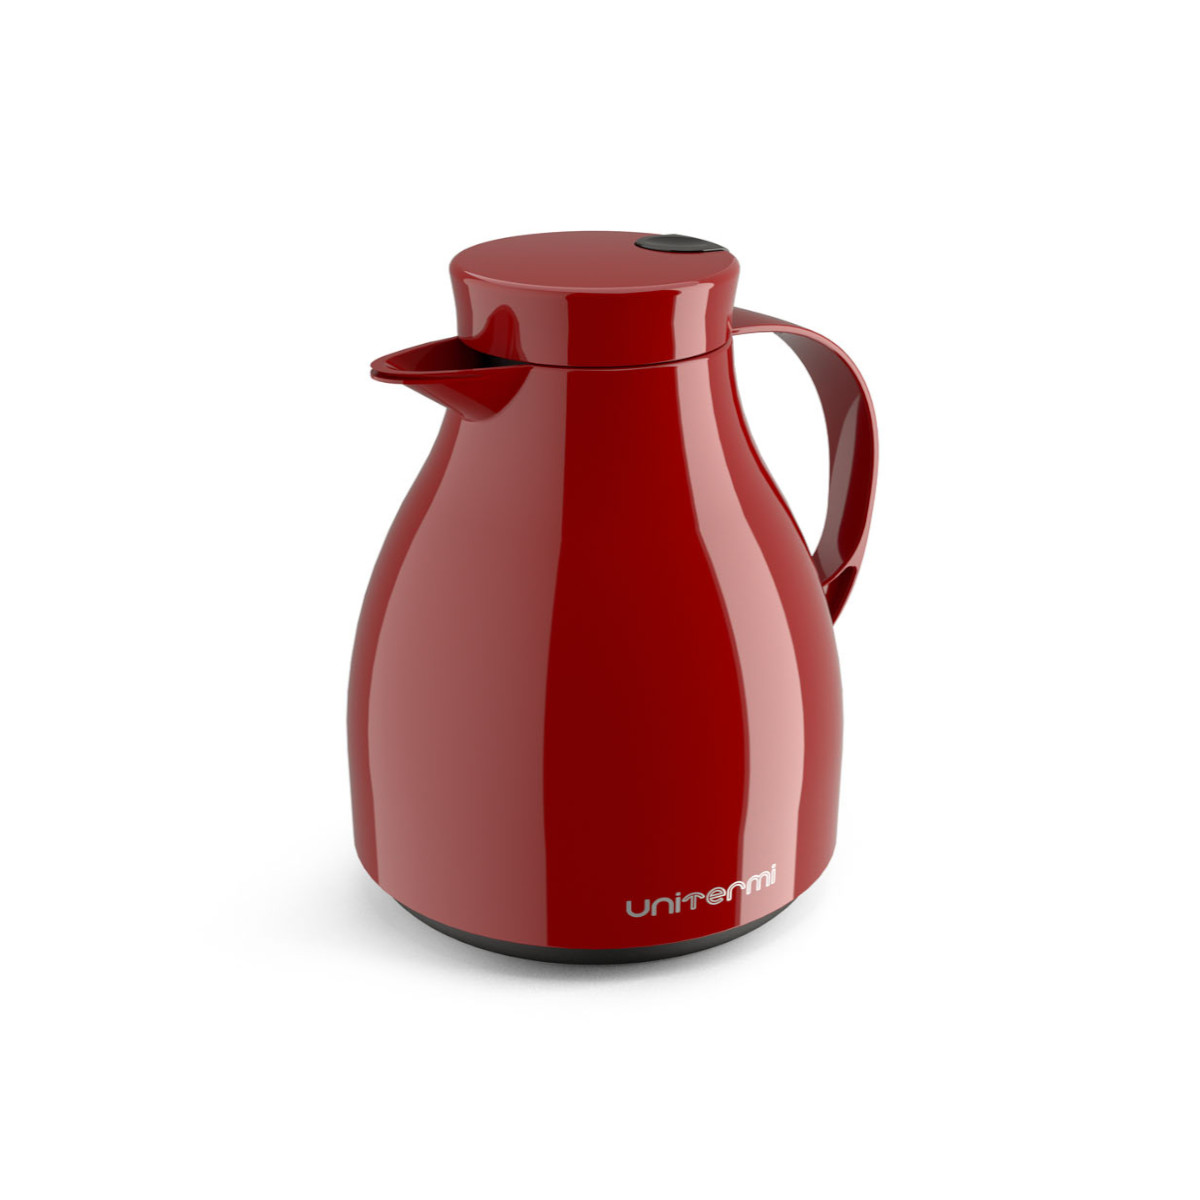 Garrafa Térmica Bule Gatilho 1 Litro Diversas Cores Chá/café